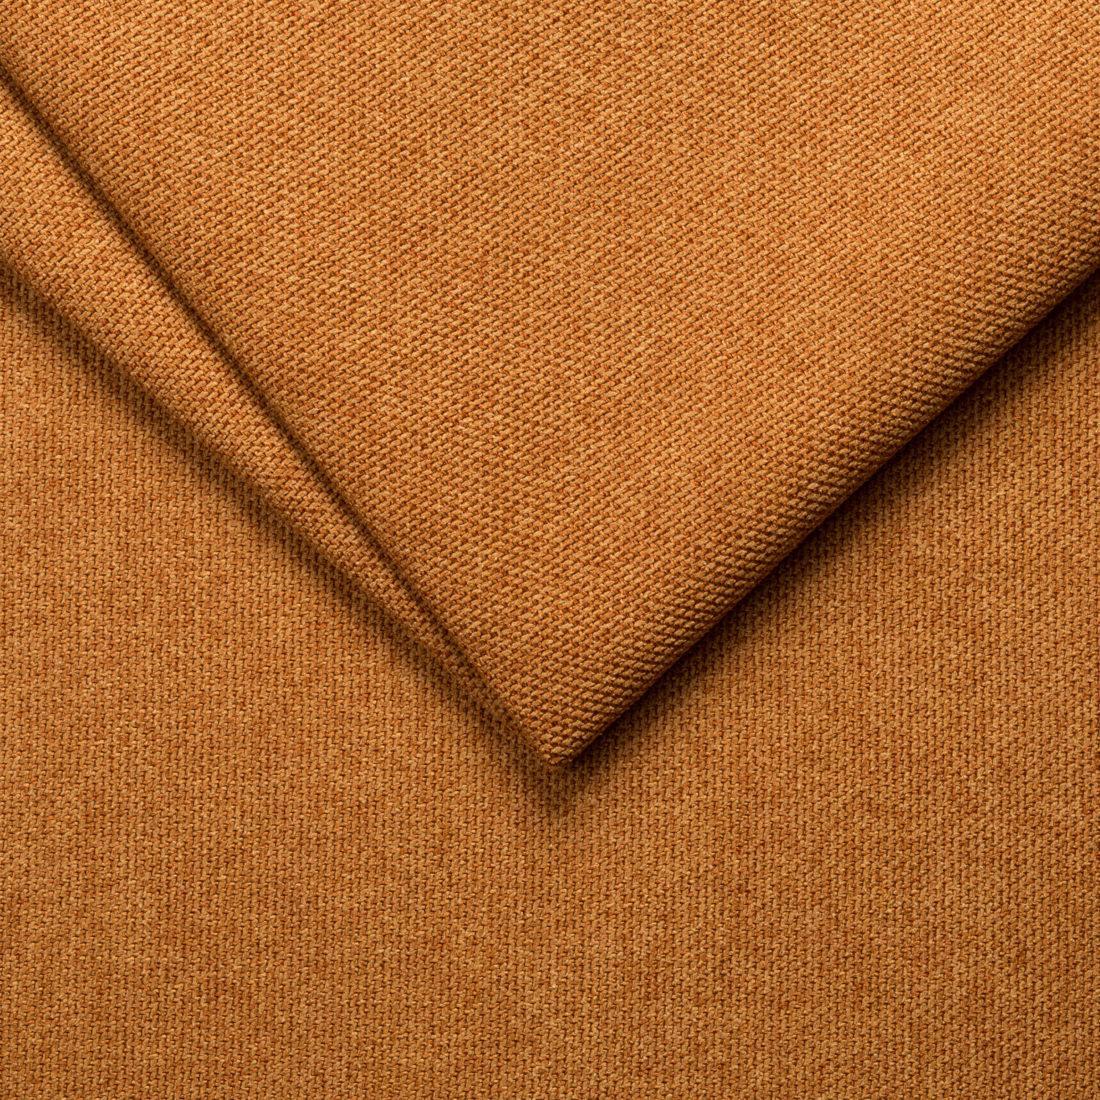 Меблева тканина Austin 10 Golden Yellow, рогожка